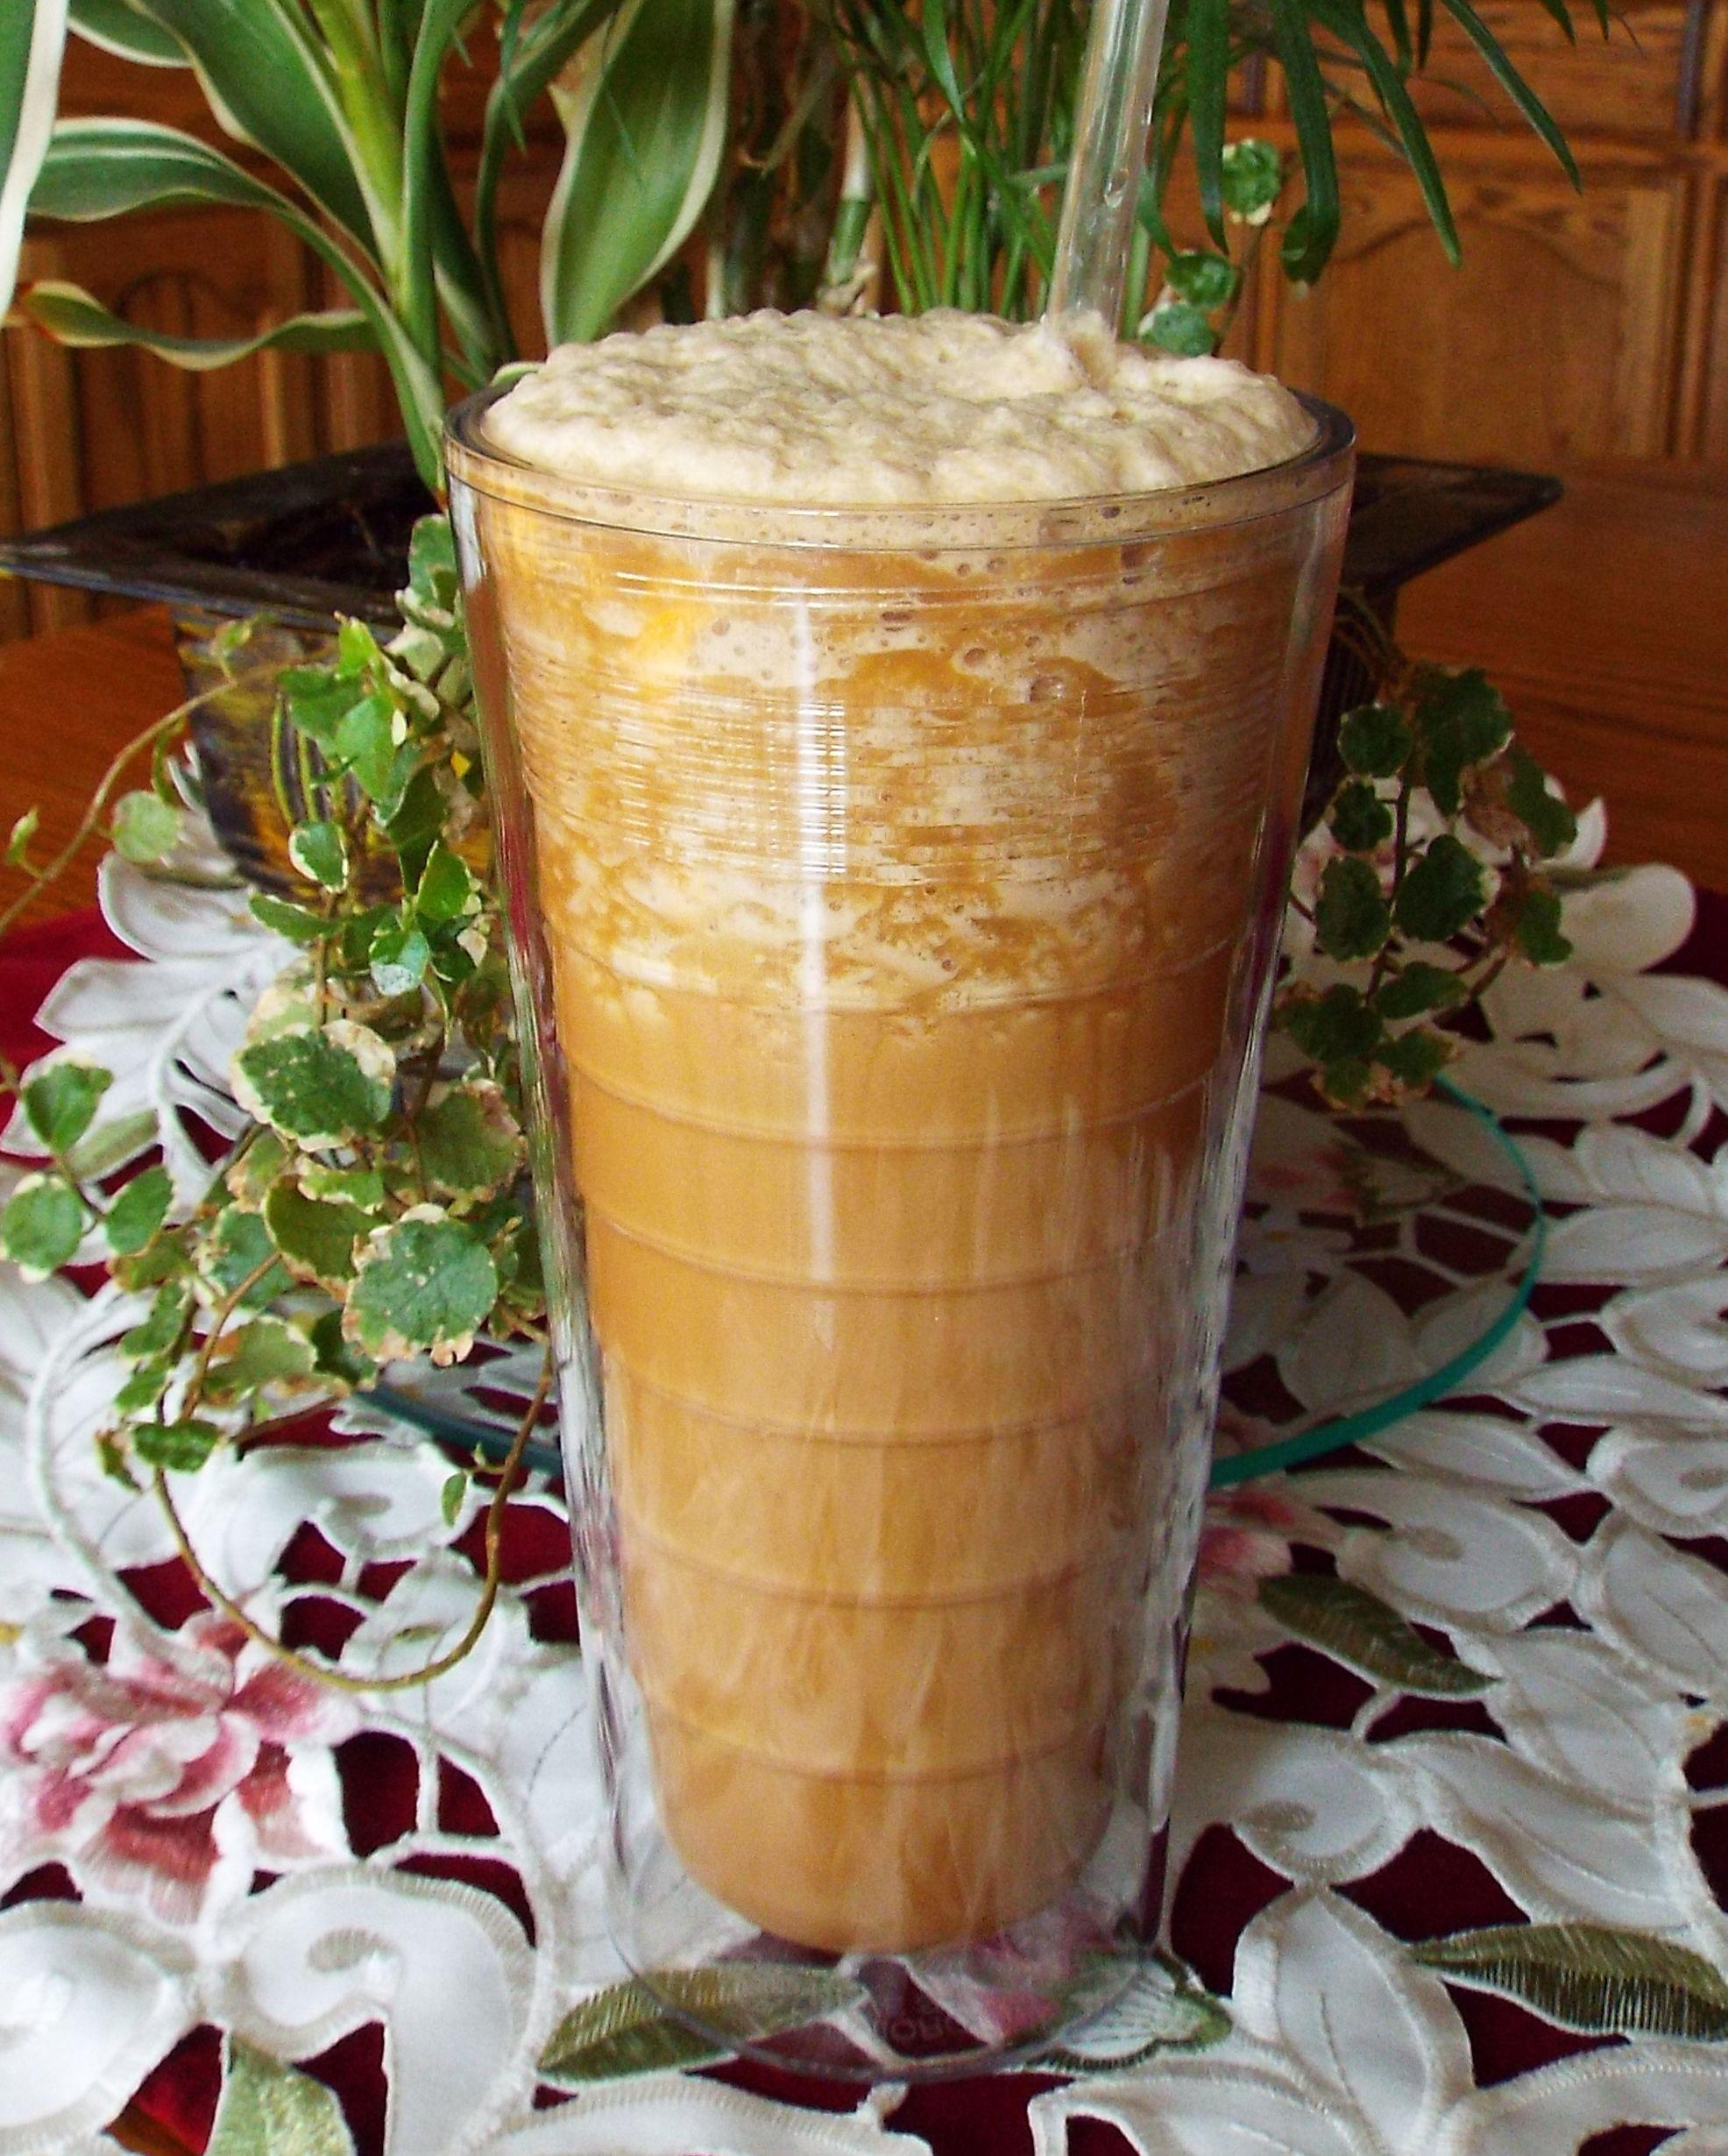 Creamy dreamy vanilla coconut ninjaccino ninja coffee